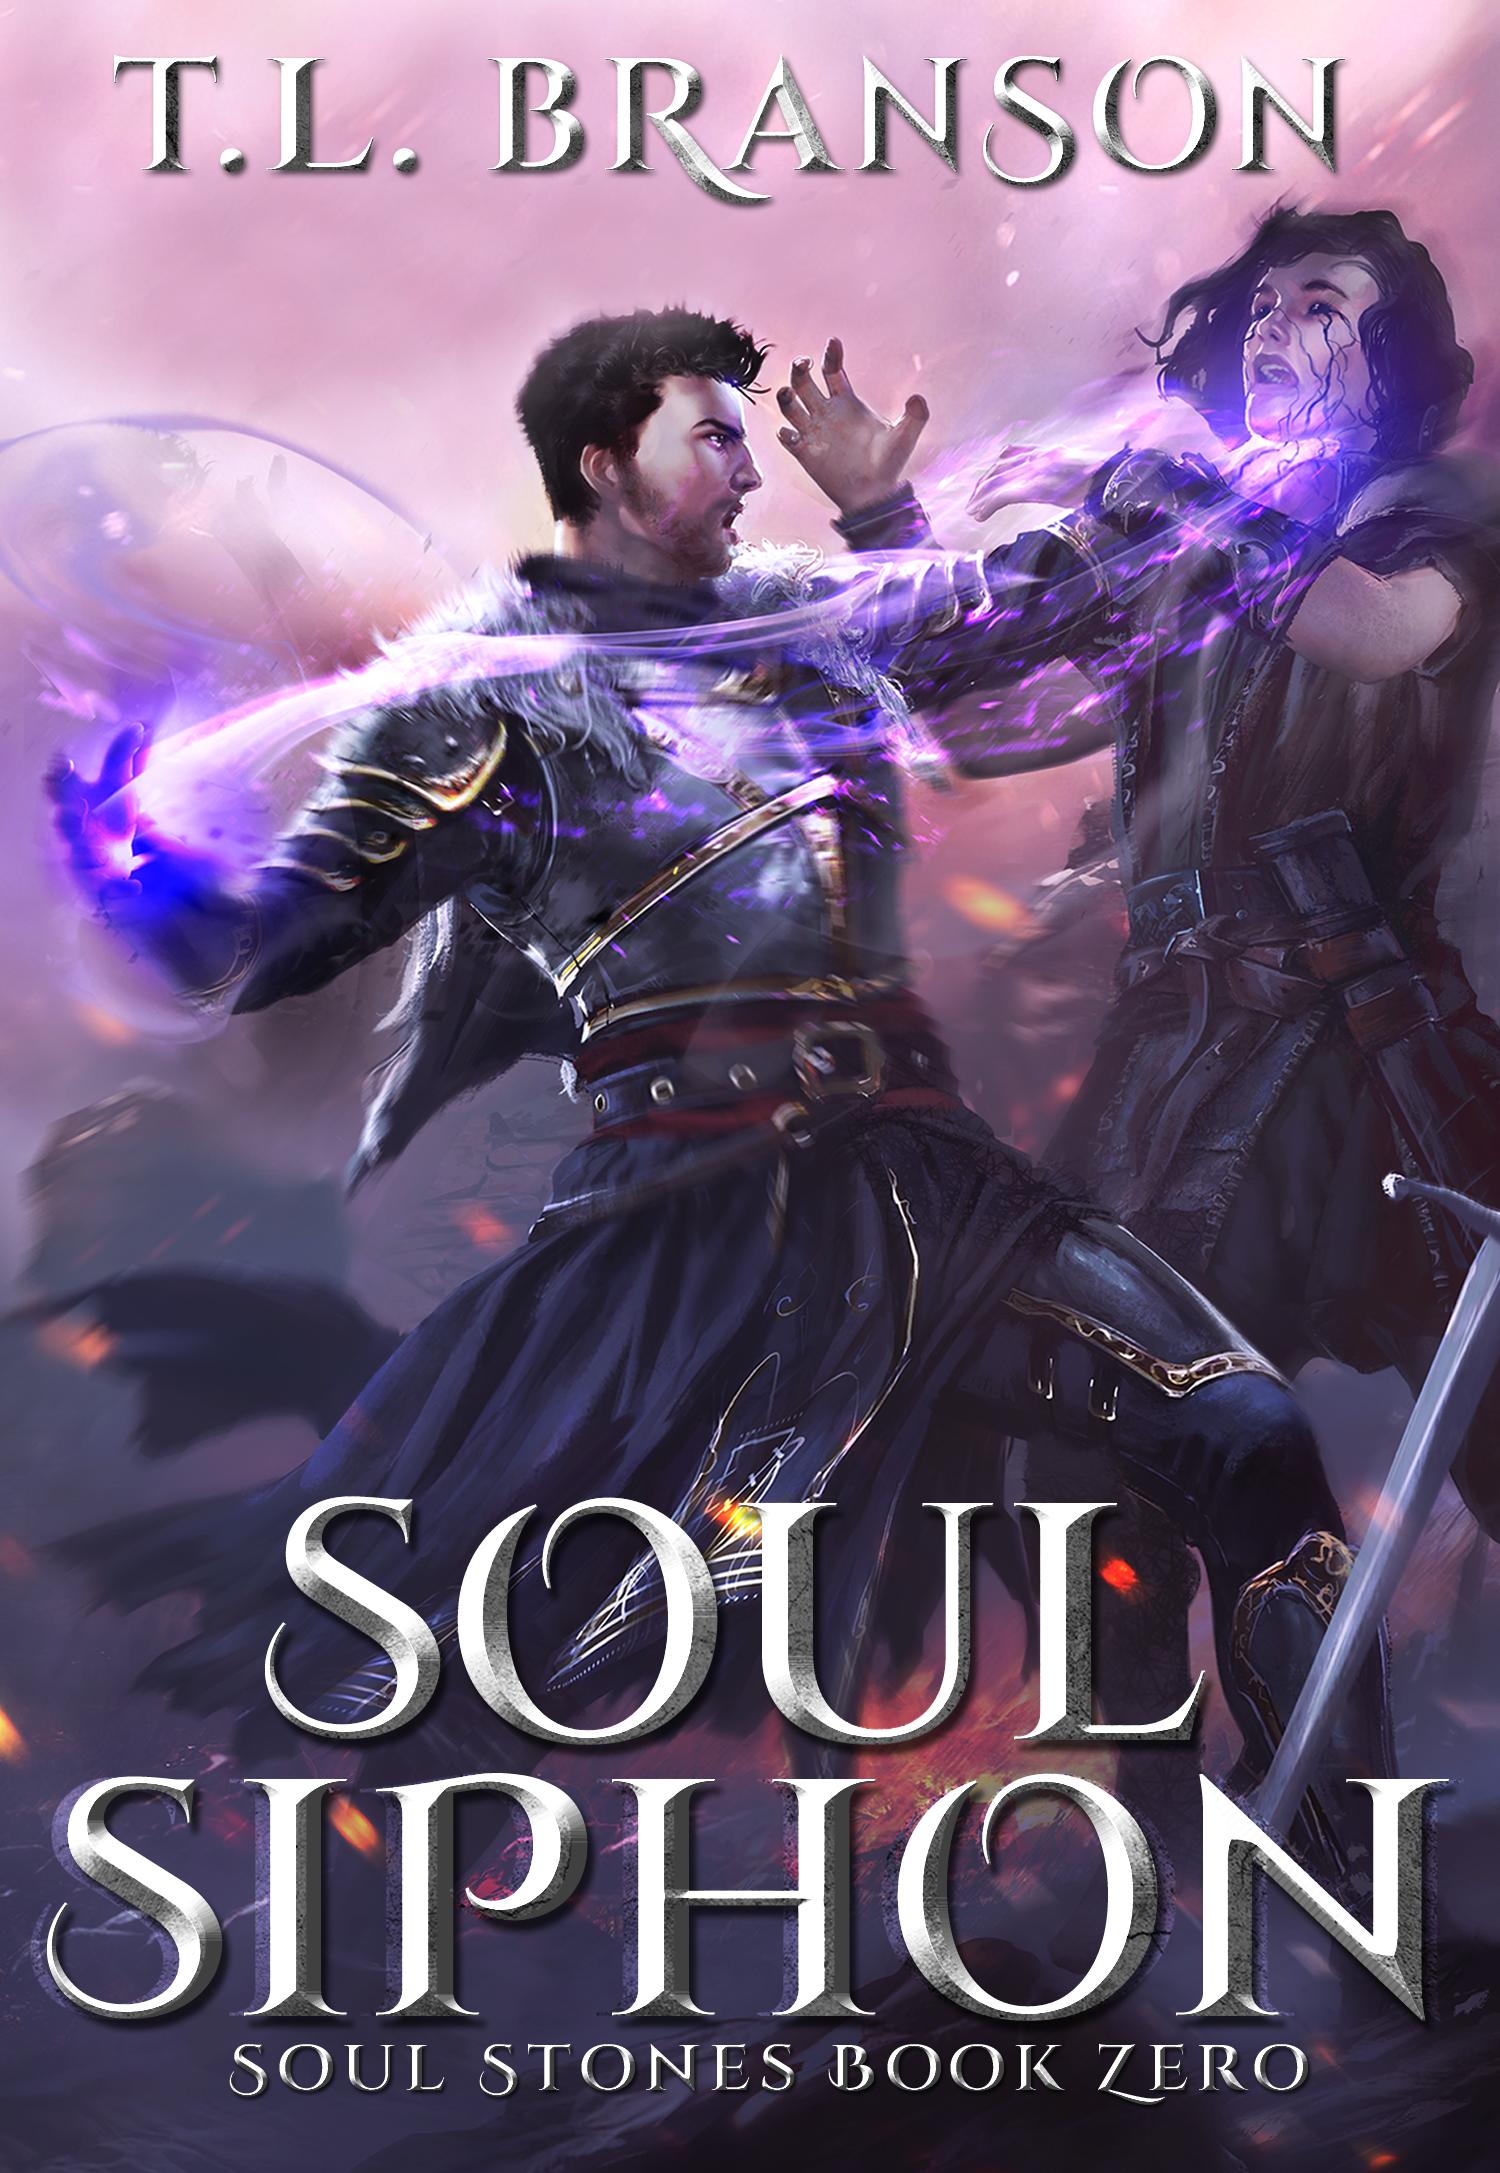 Epic Fantasy Book cover for Soul Siphon, the prequel novella